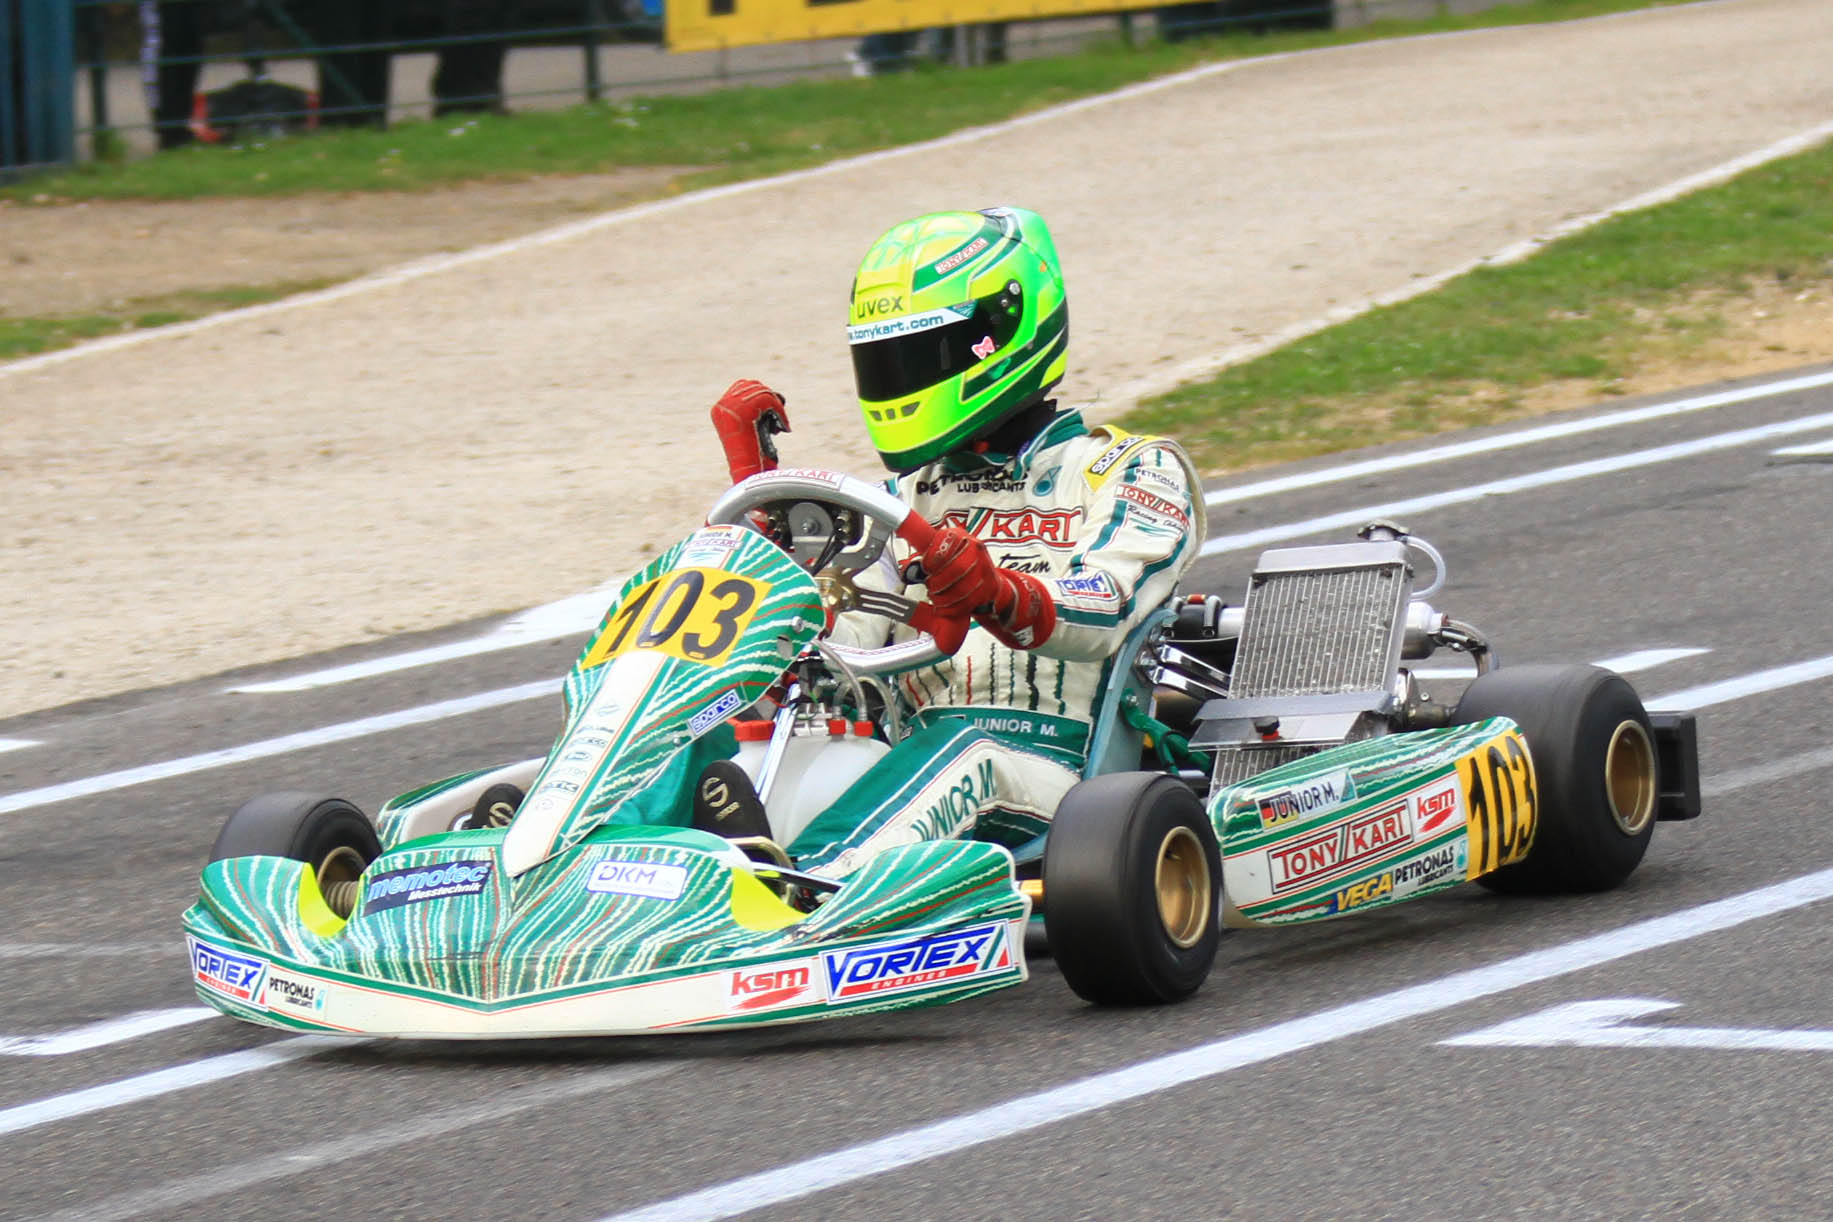 KSM Racing Team übernimmt DJKM-Gesamtführung